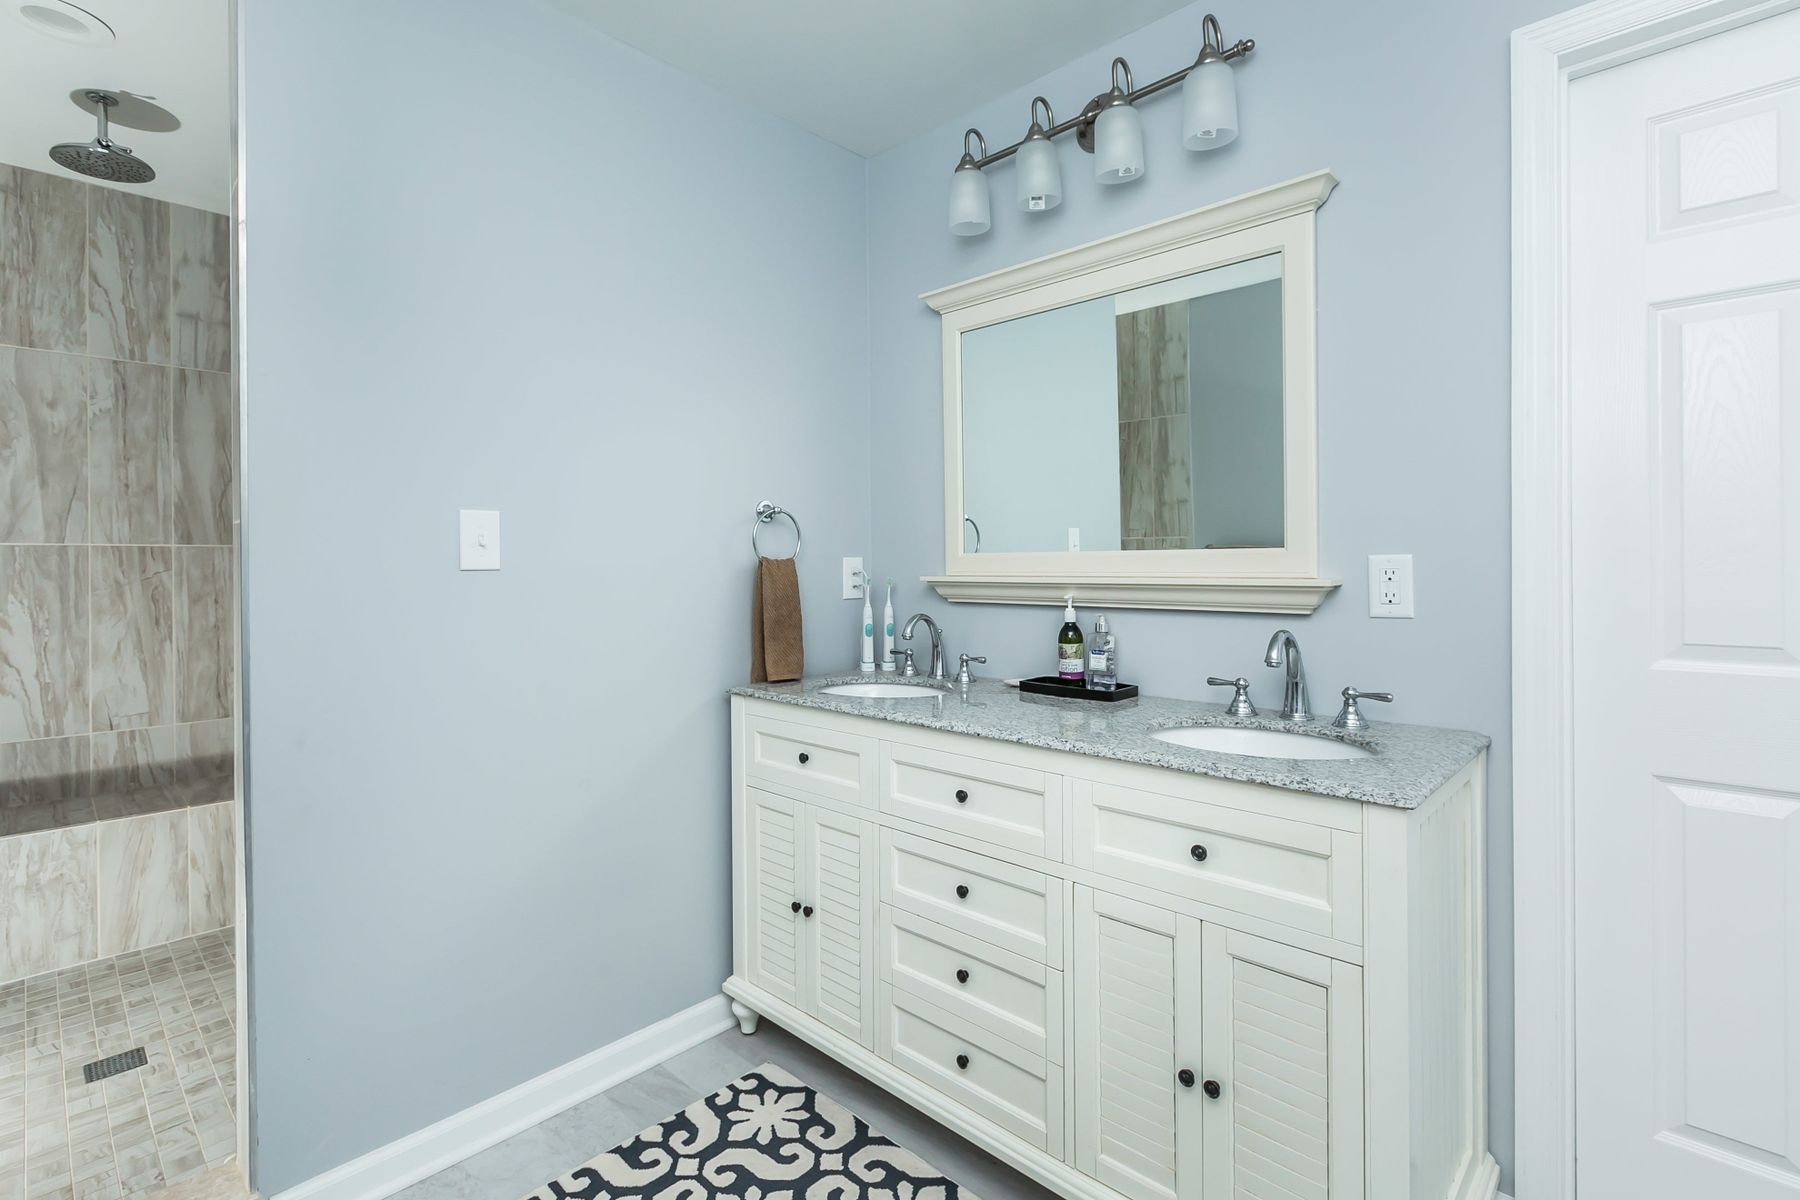 Whole House Remodels In Baltimore Design Build Remodeling Group - Bathroom remodeling anne arundel county